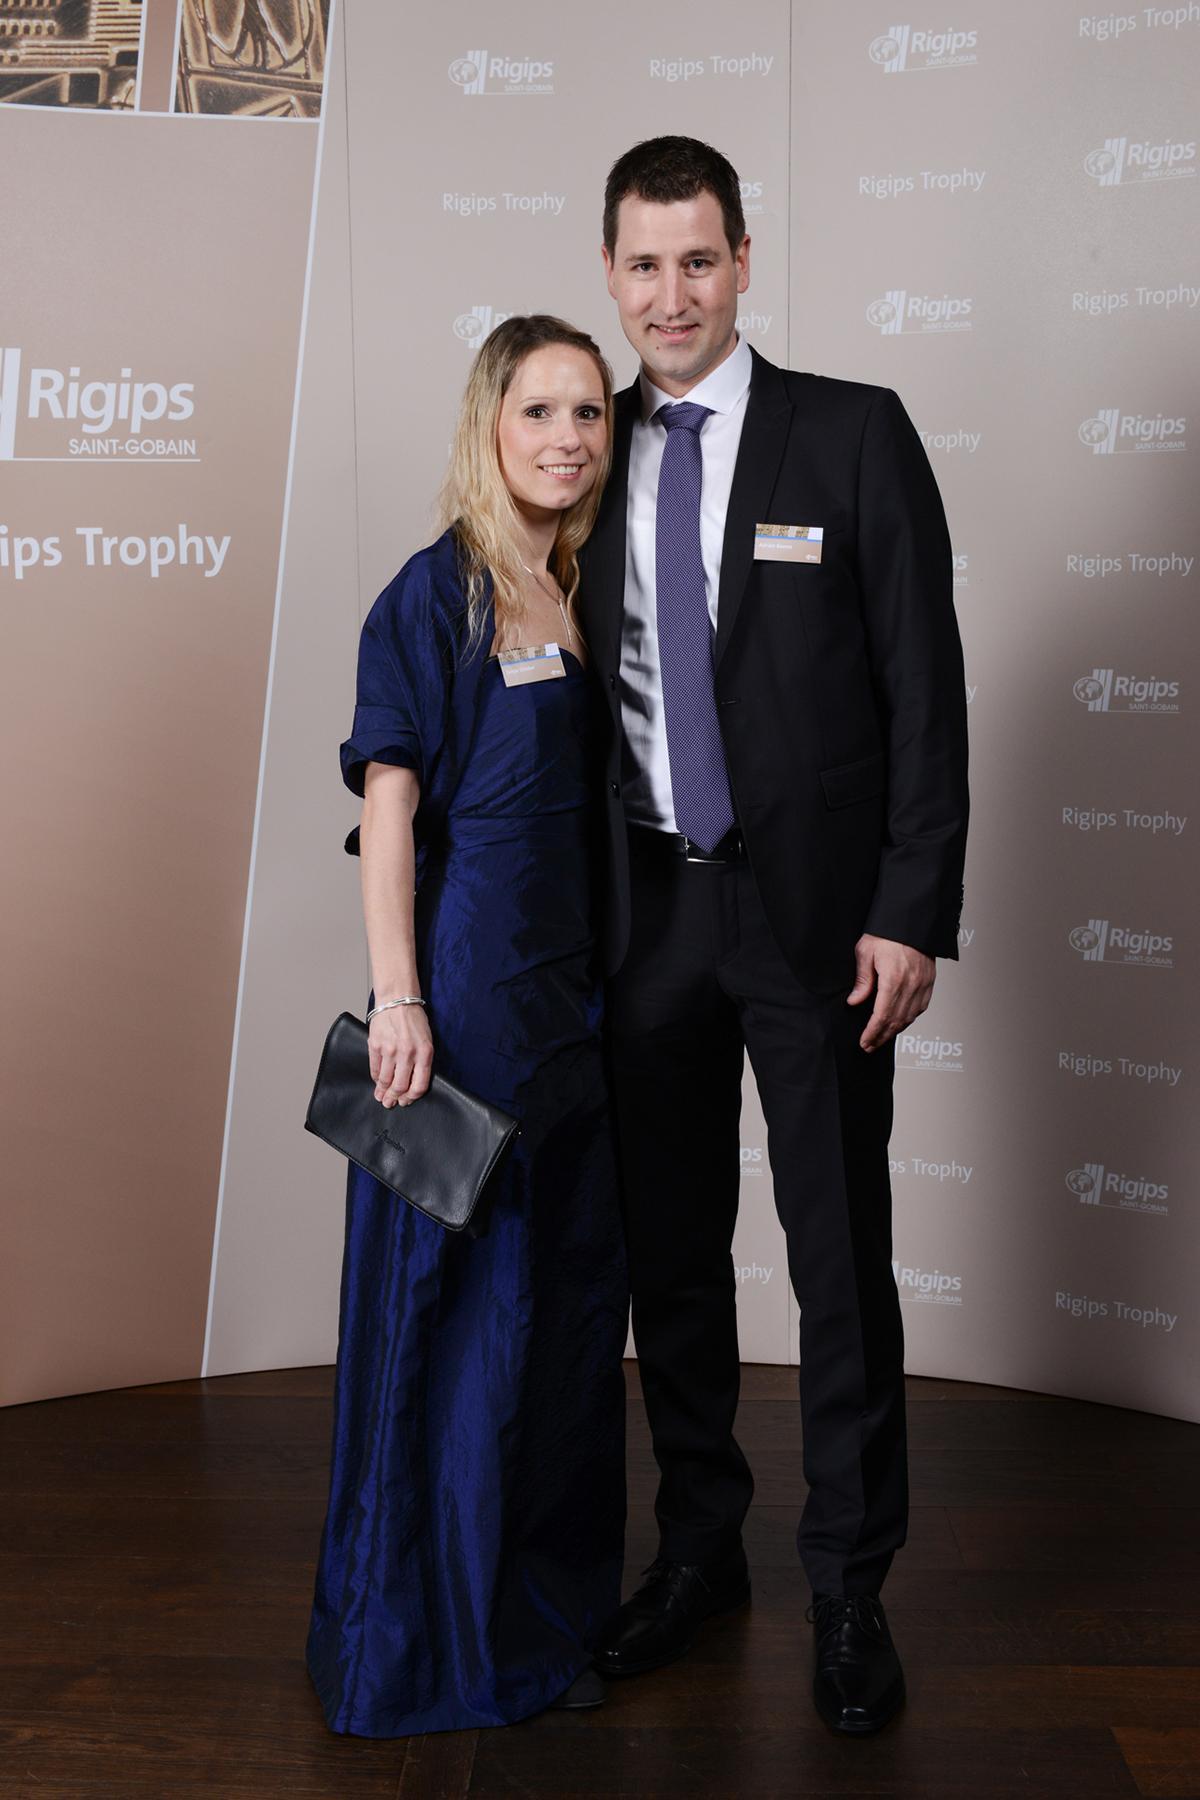 Rigips Trophy 16_0240